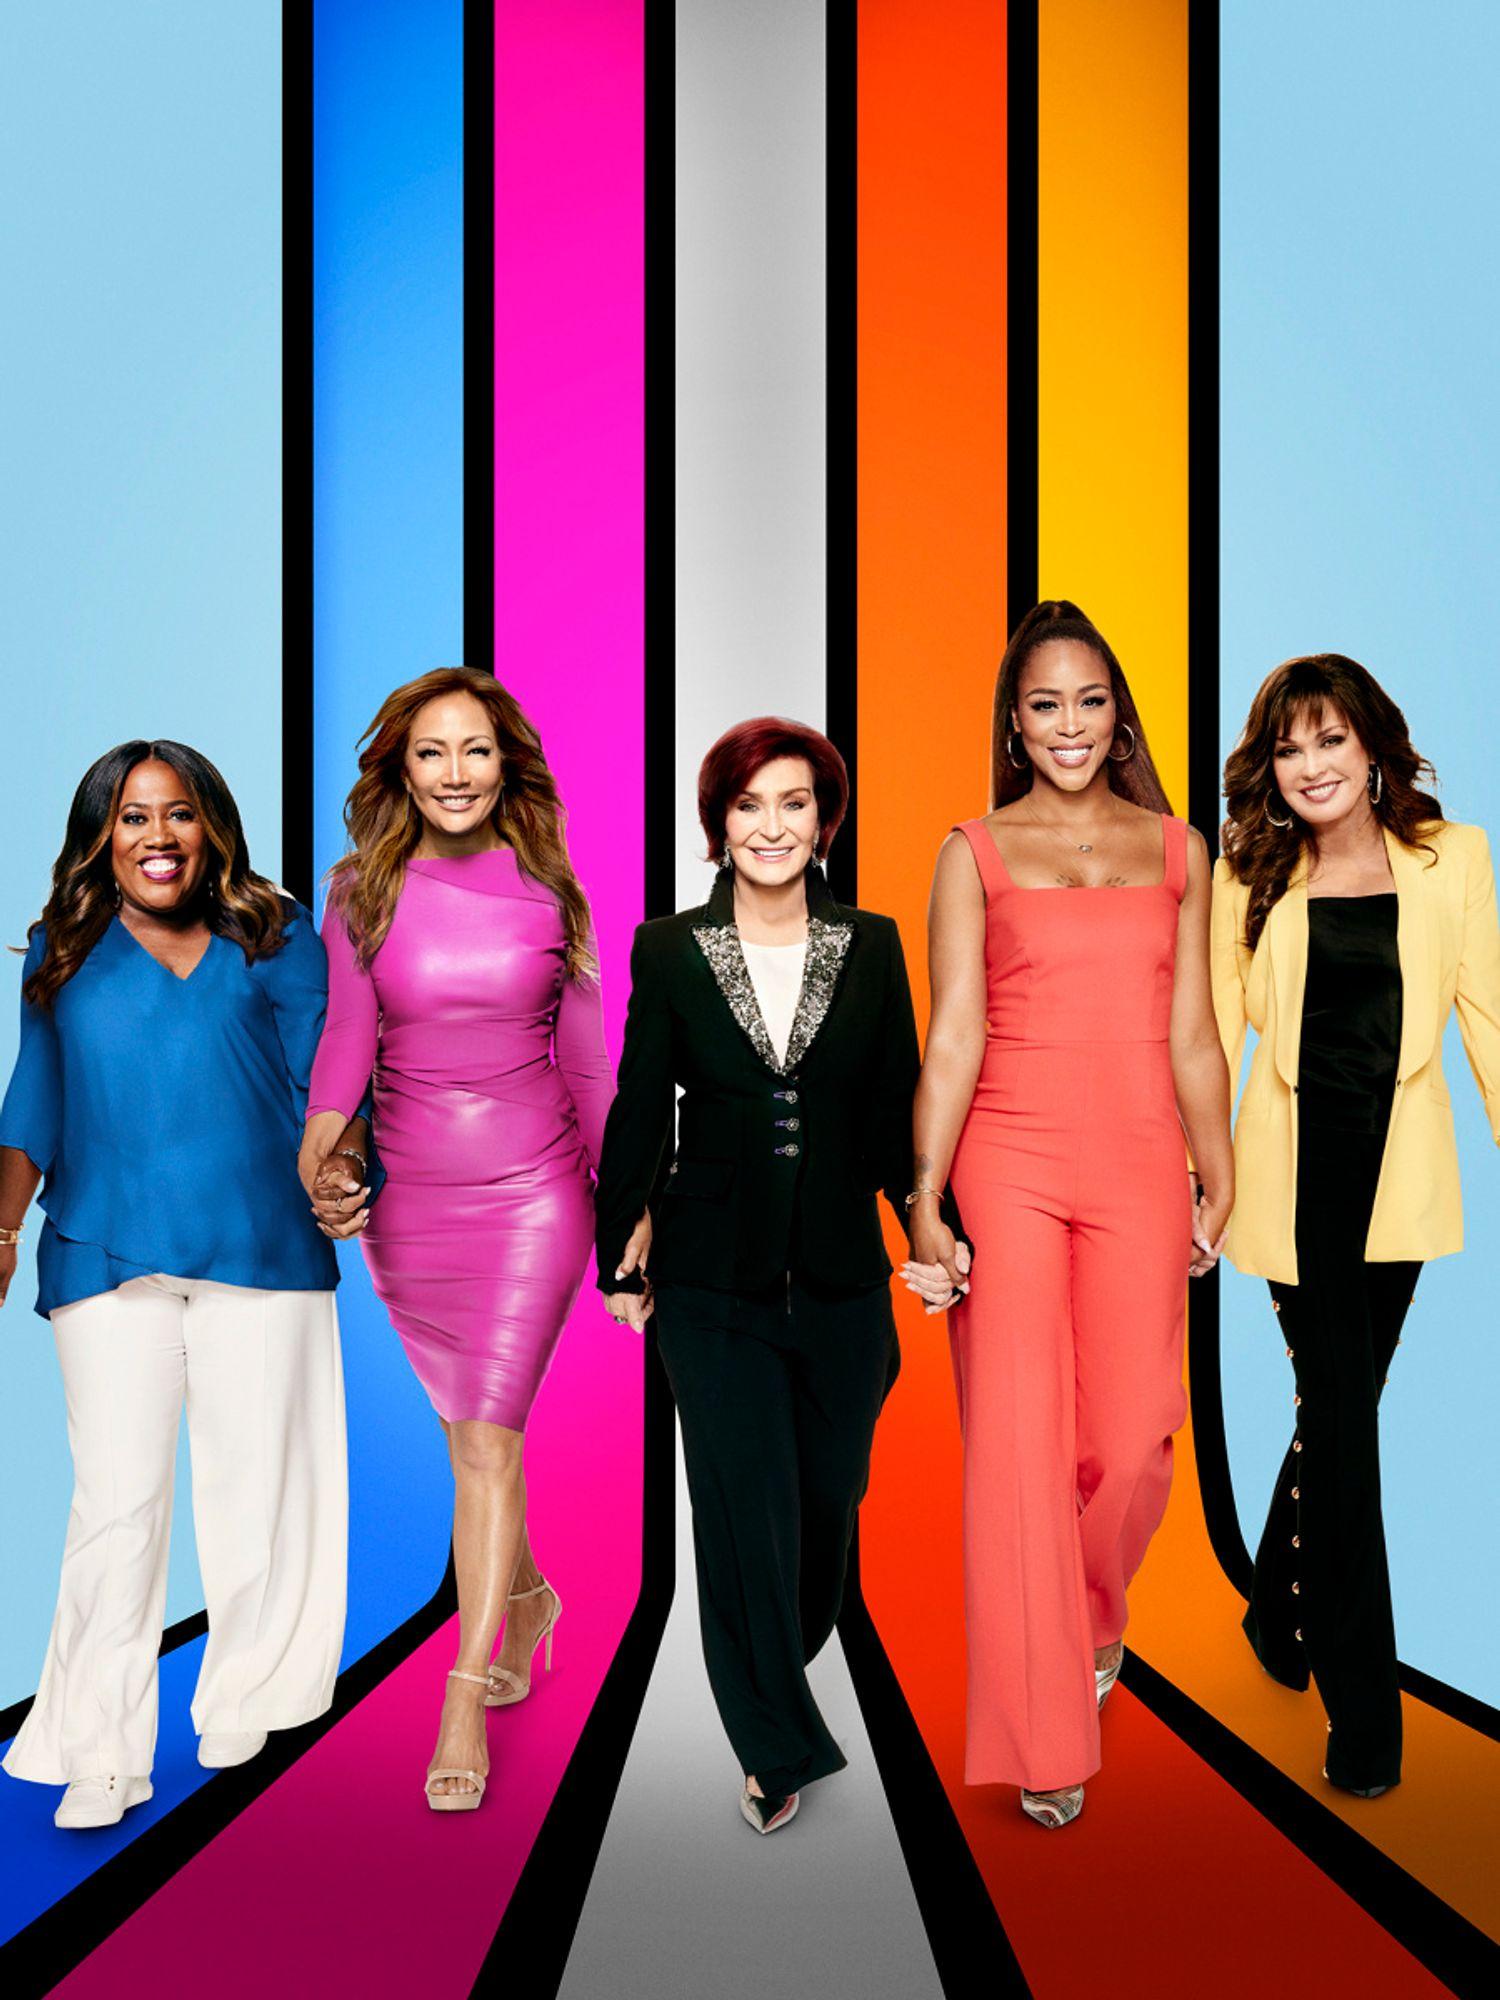 Sheryl Underwood, Carrie Ann Inaba, Sharon Osbourne, Eve Cooper, and Marie Osmond.